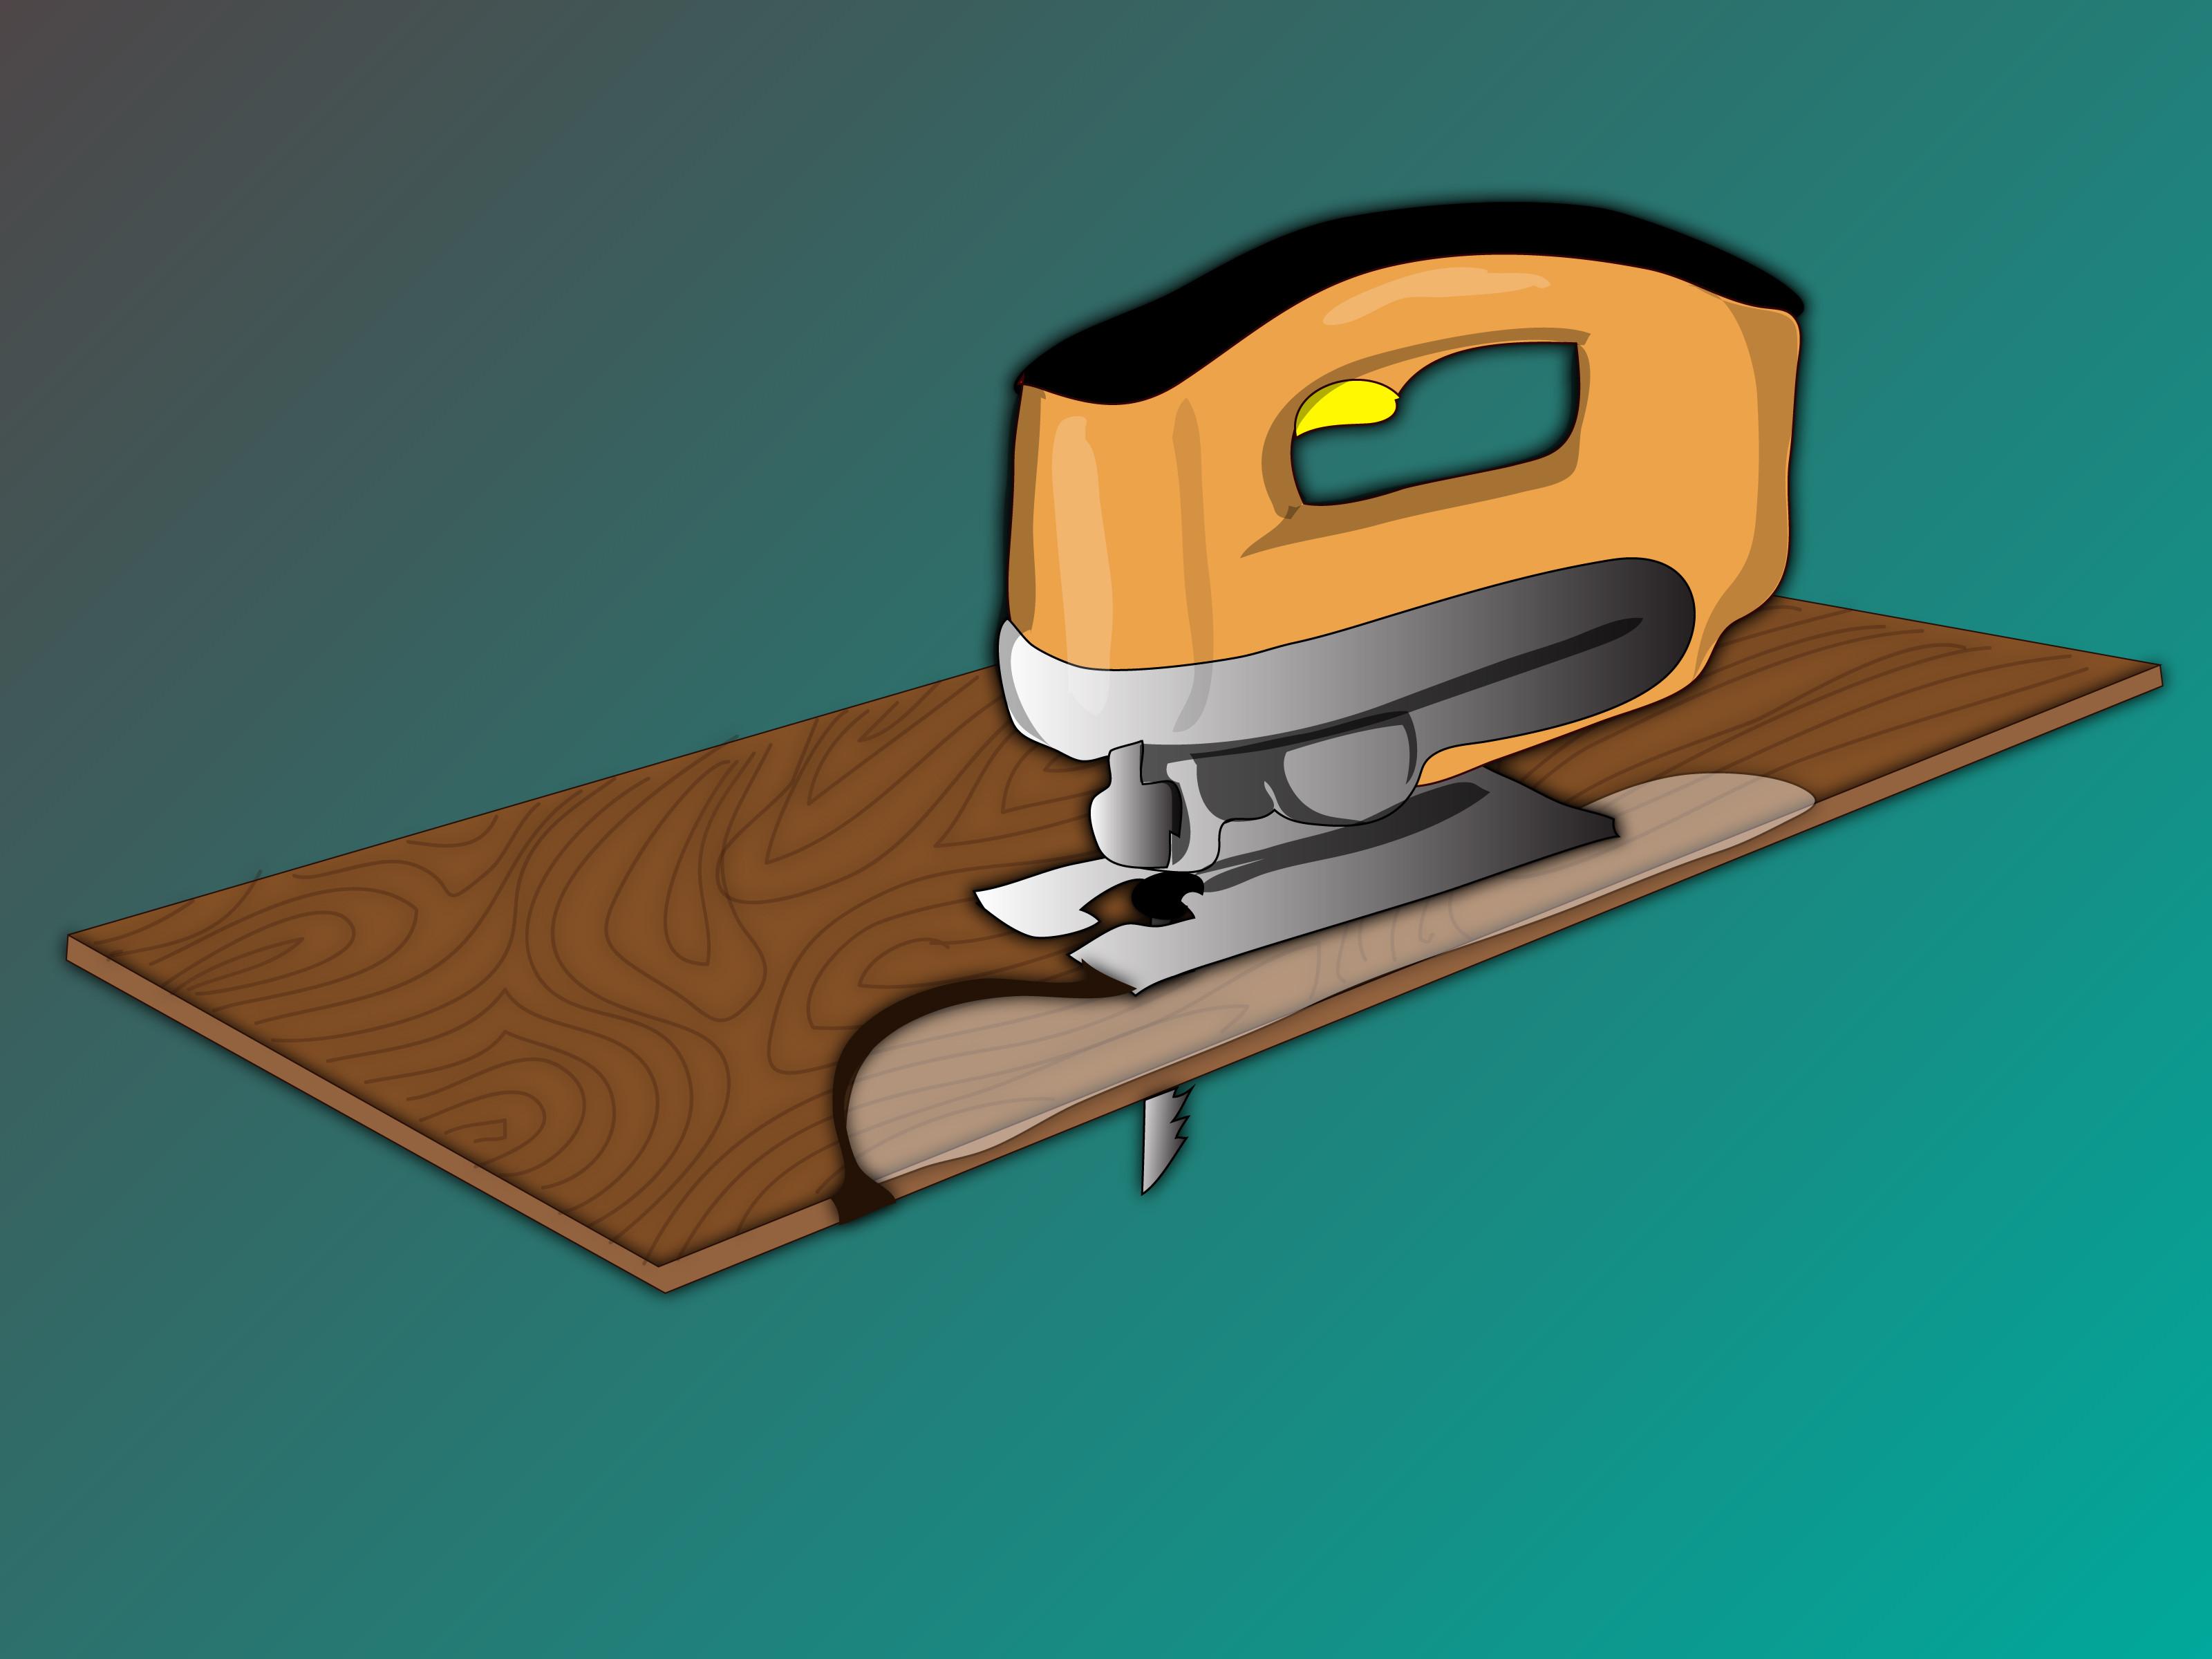 17 attractive Hardwood Flooring tools 2021 free download hardwood flooring tools of how to cut laminate flooring 6 steps with pictures wikihow regarding cut laminate flooring step 6